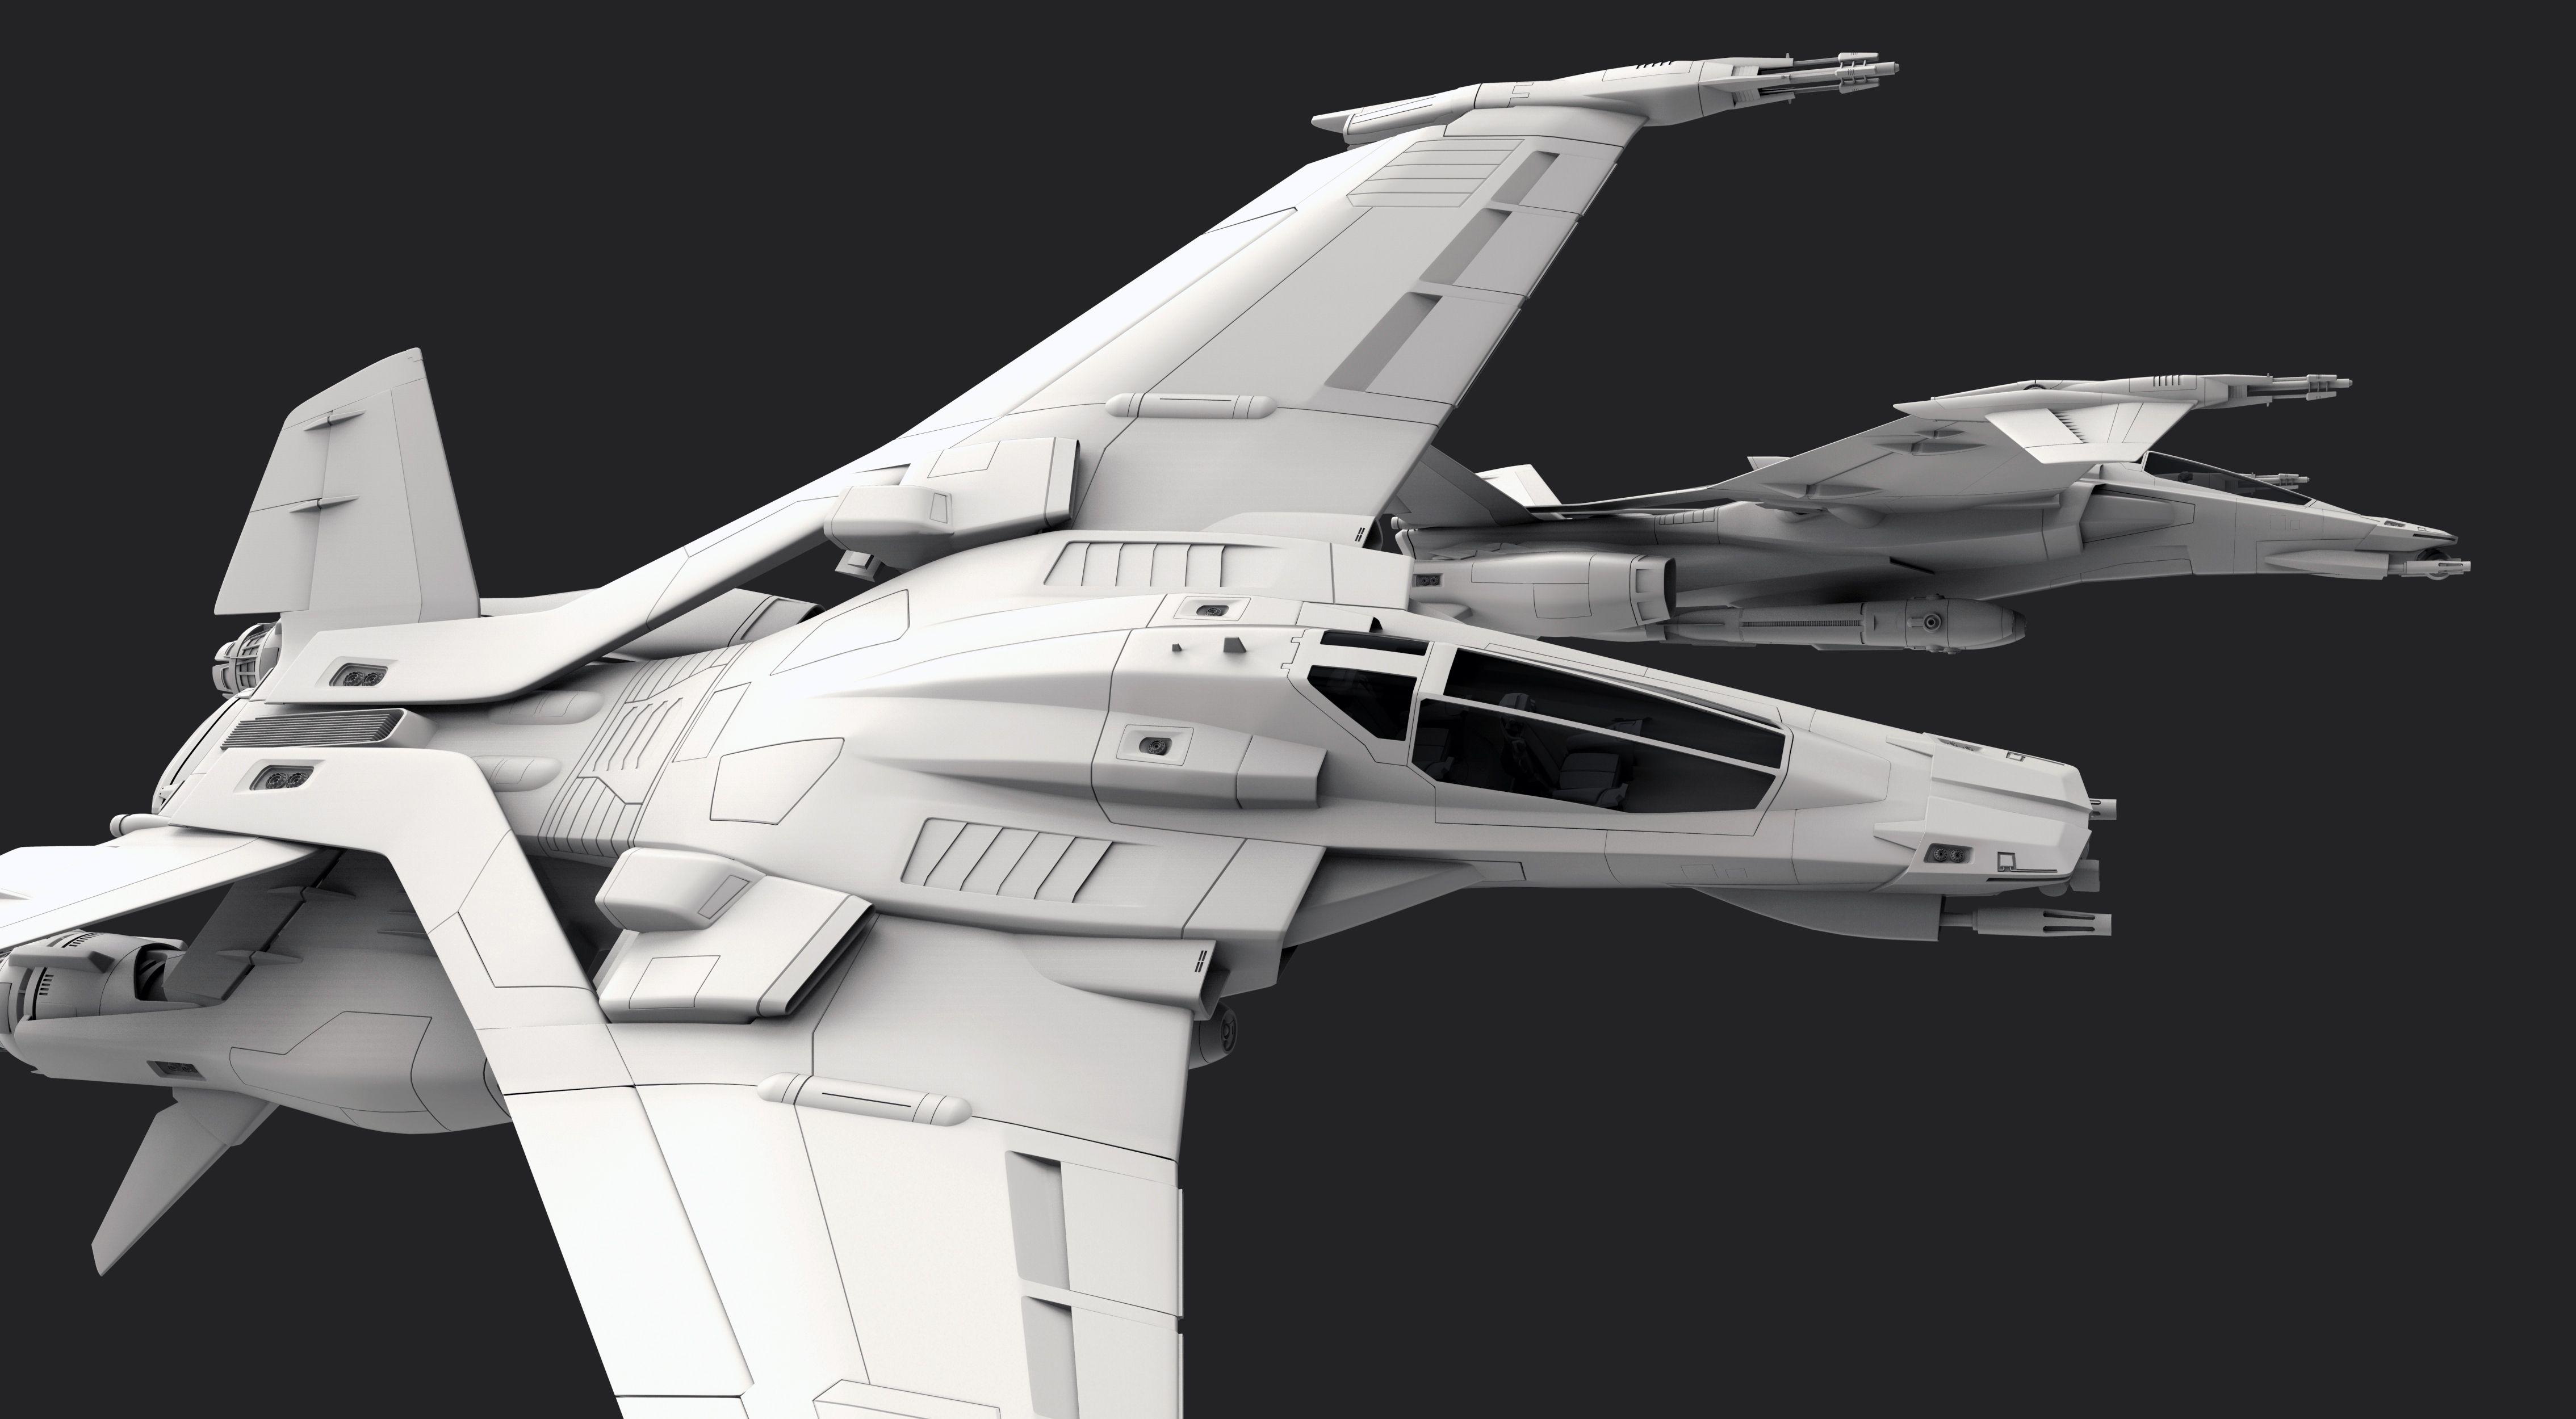 Cgtalk - Thrust Challenge Myrmidon Fighter 3d Landon L. Ephalanx Dessins